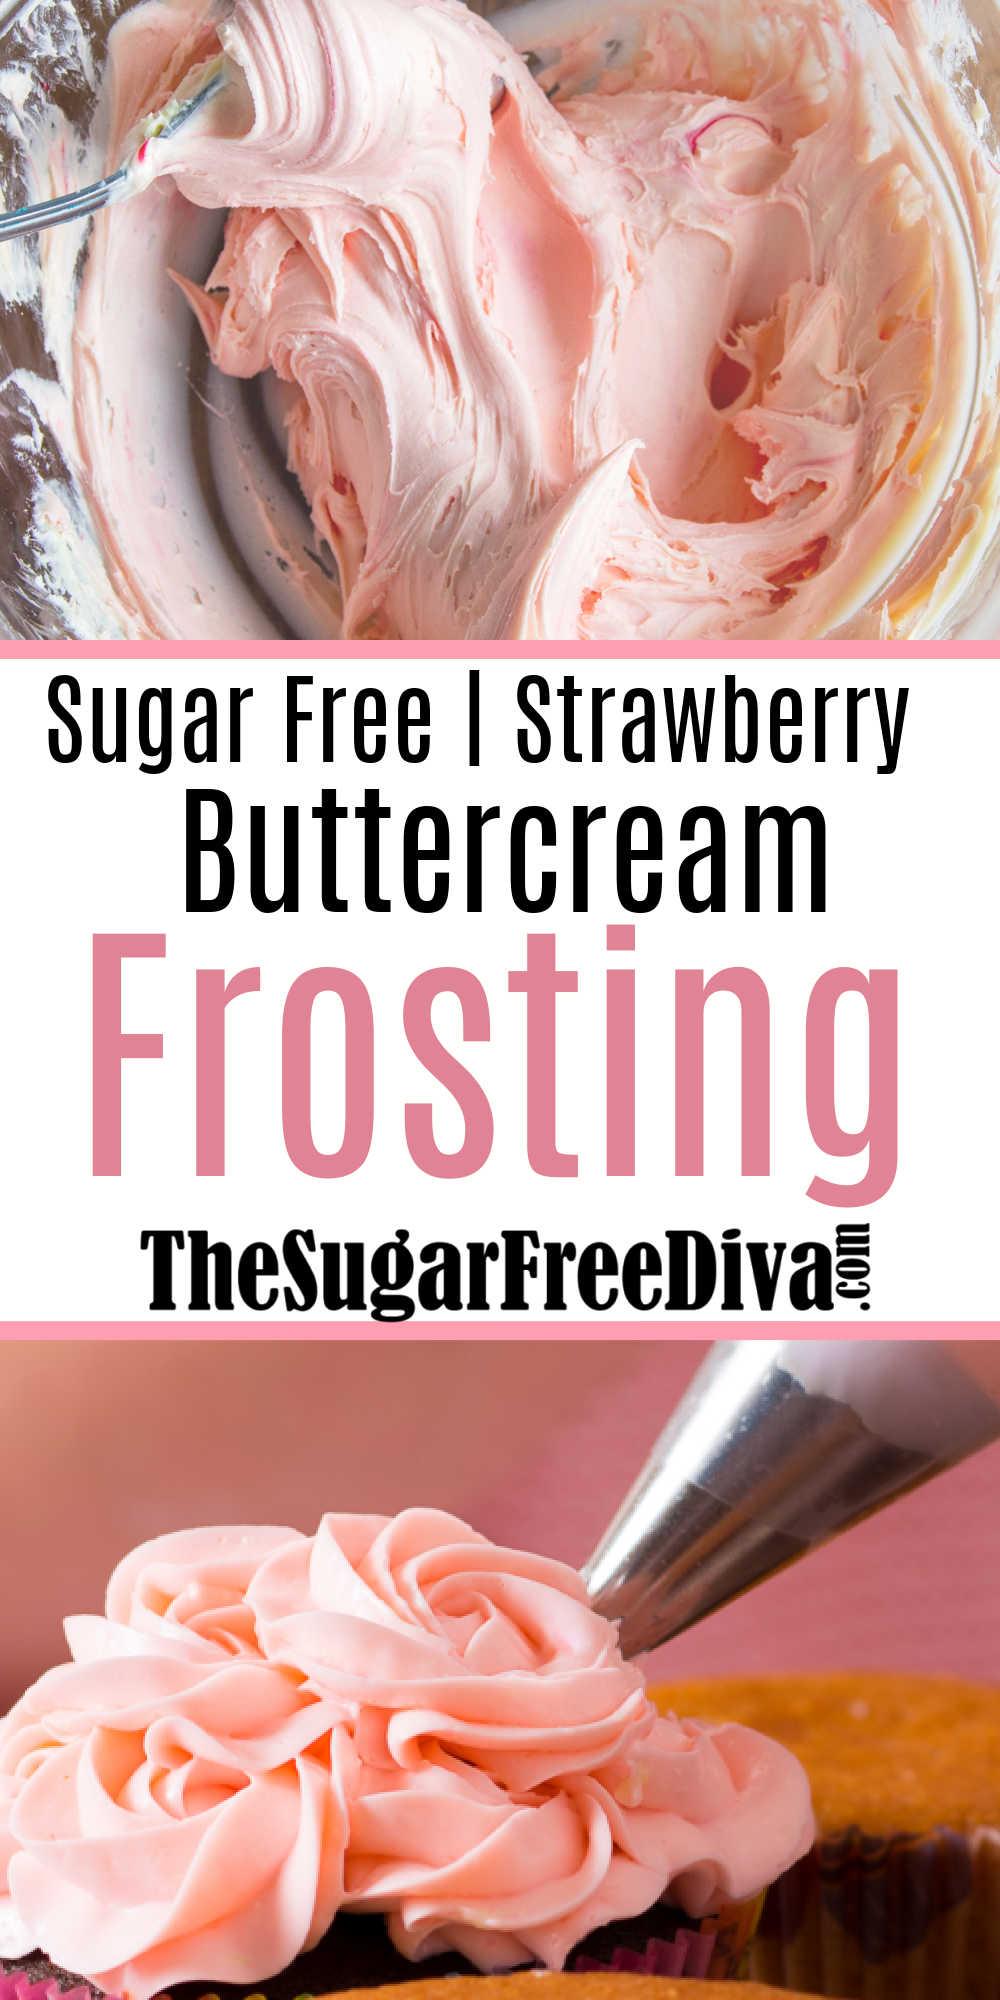 Sugar Free Strawberry Buttercream Frosting